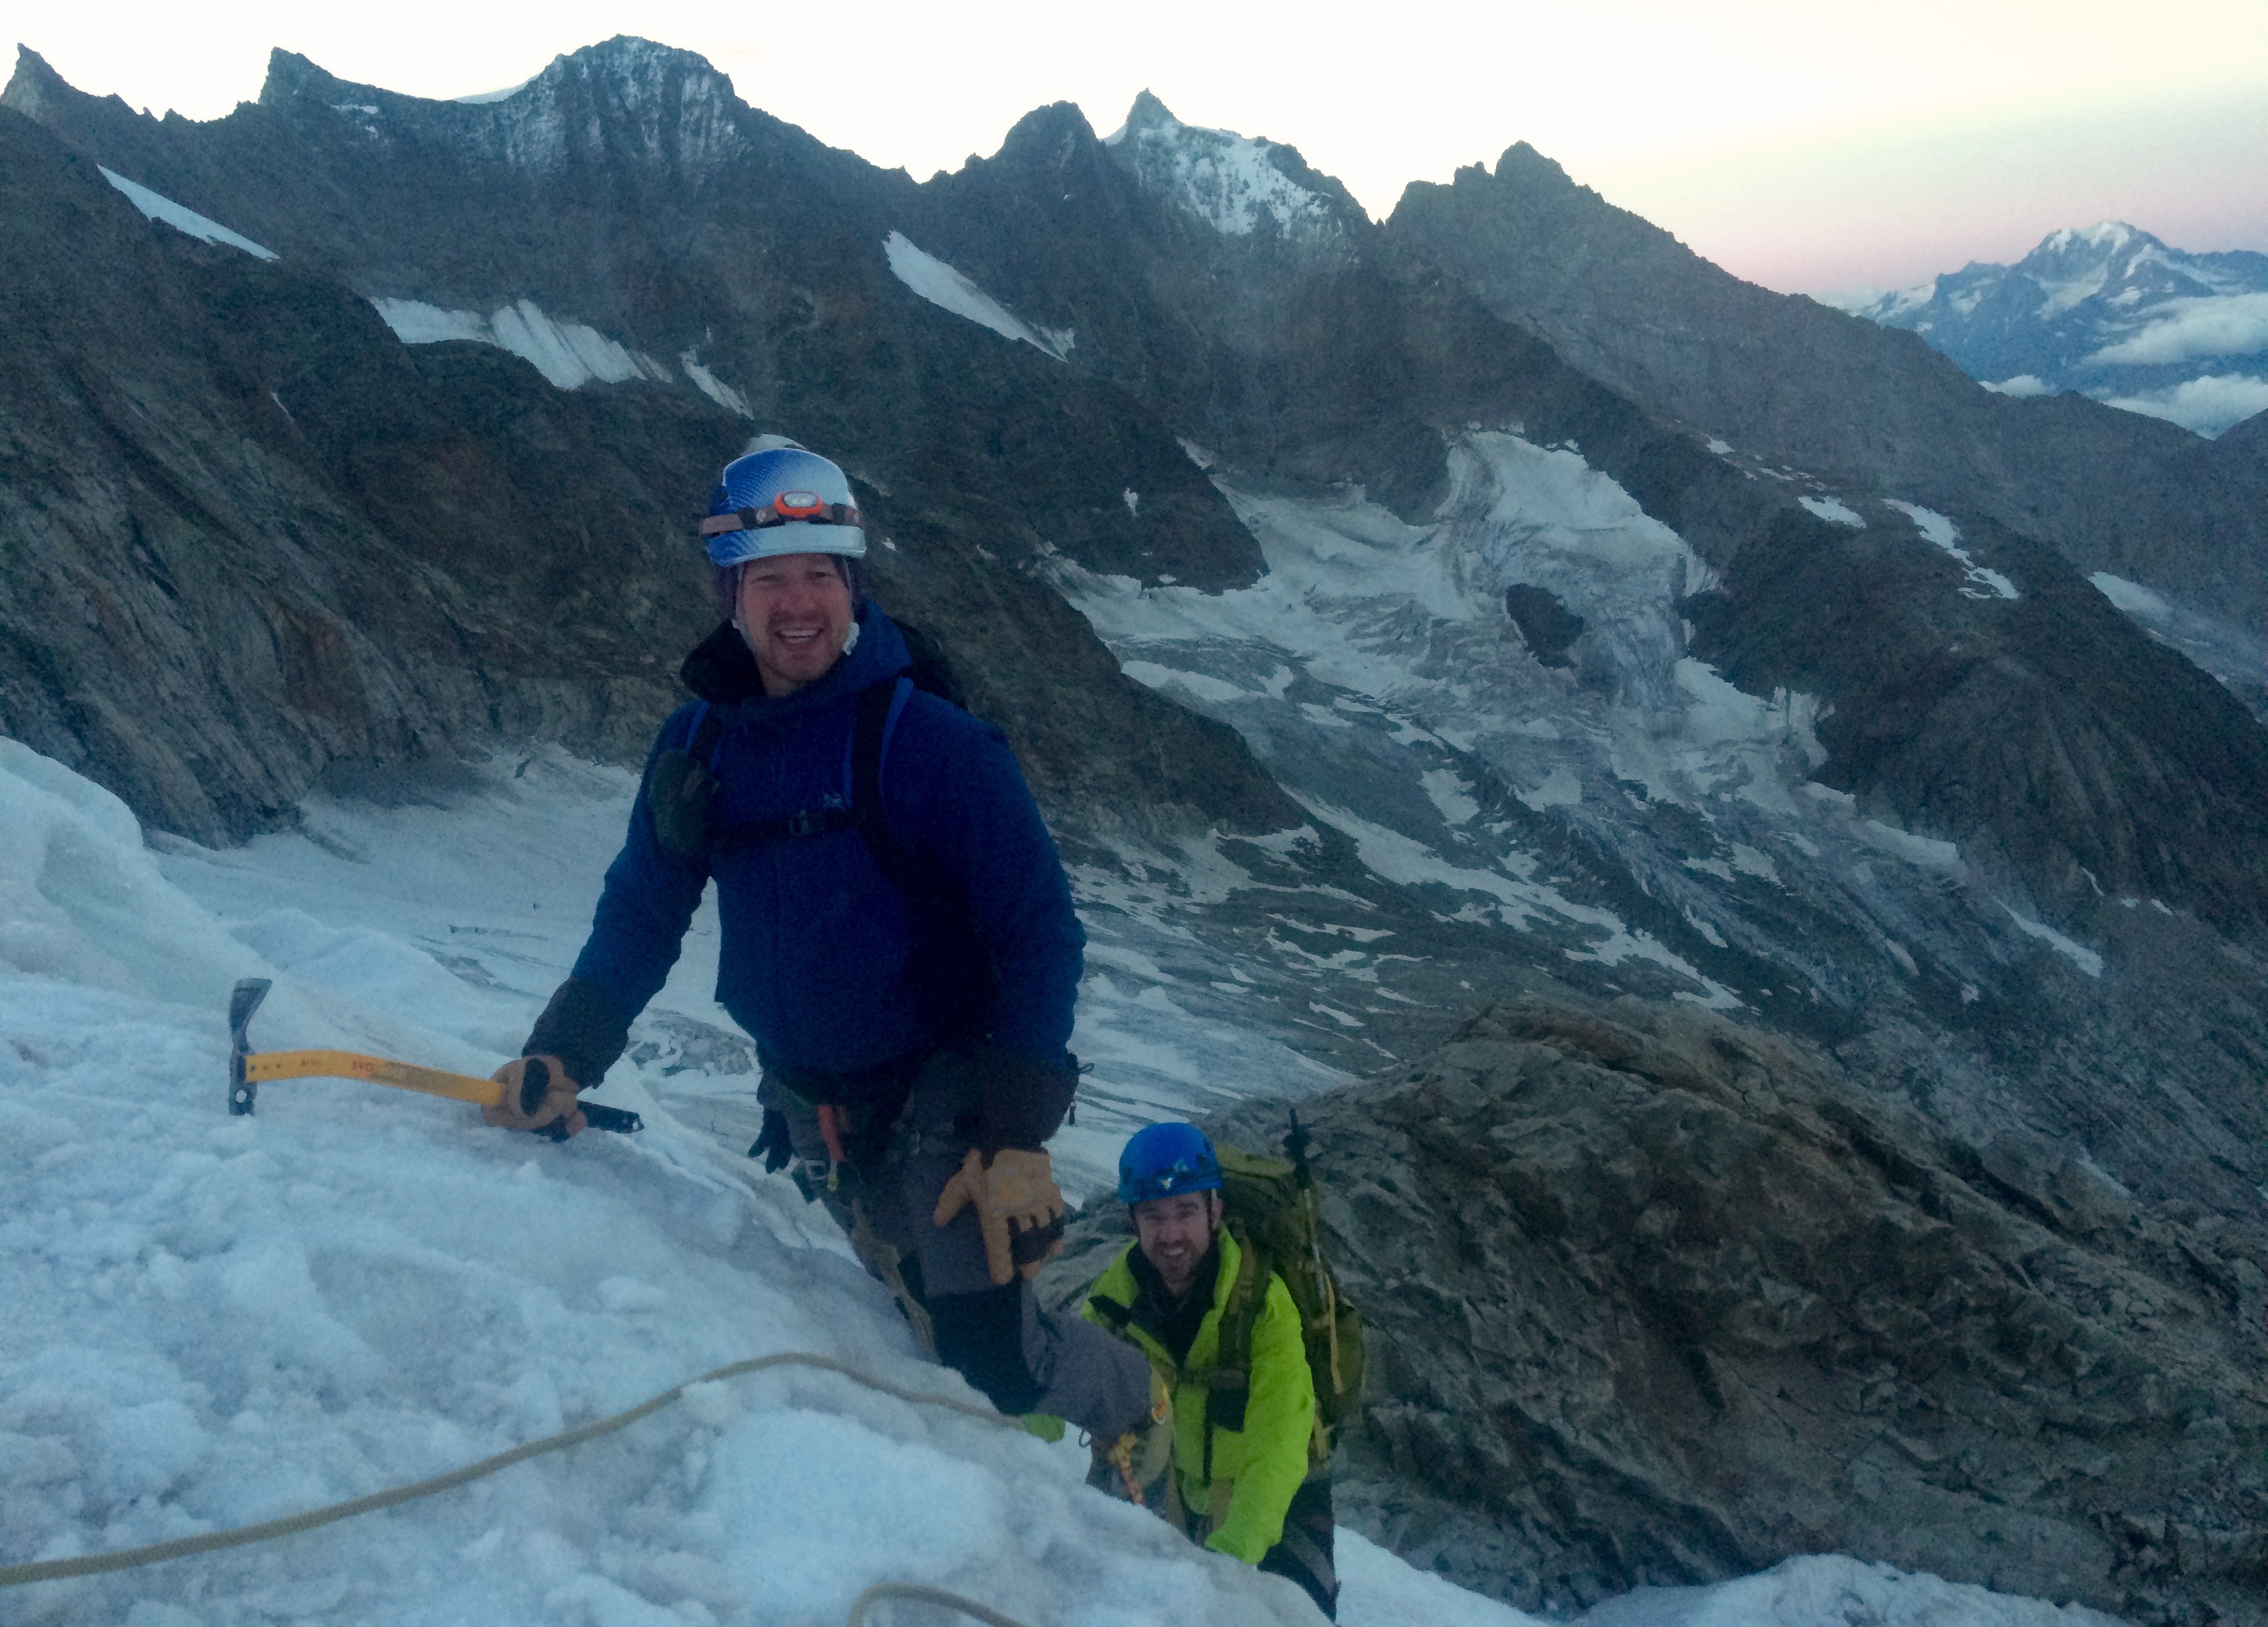 Het steile stukje ijsklimmen op de Aletschhorn